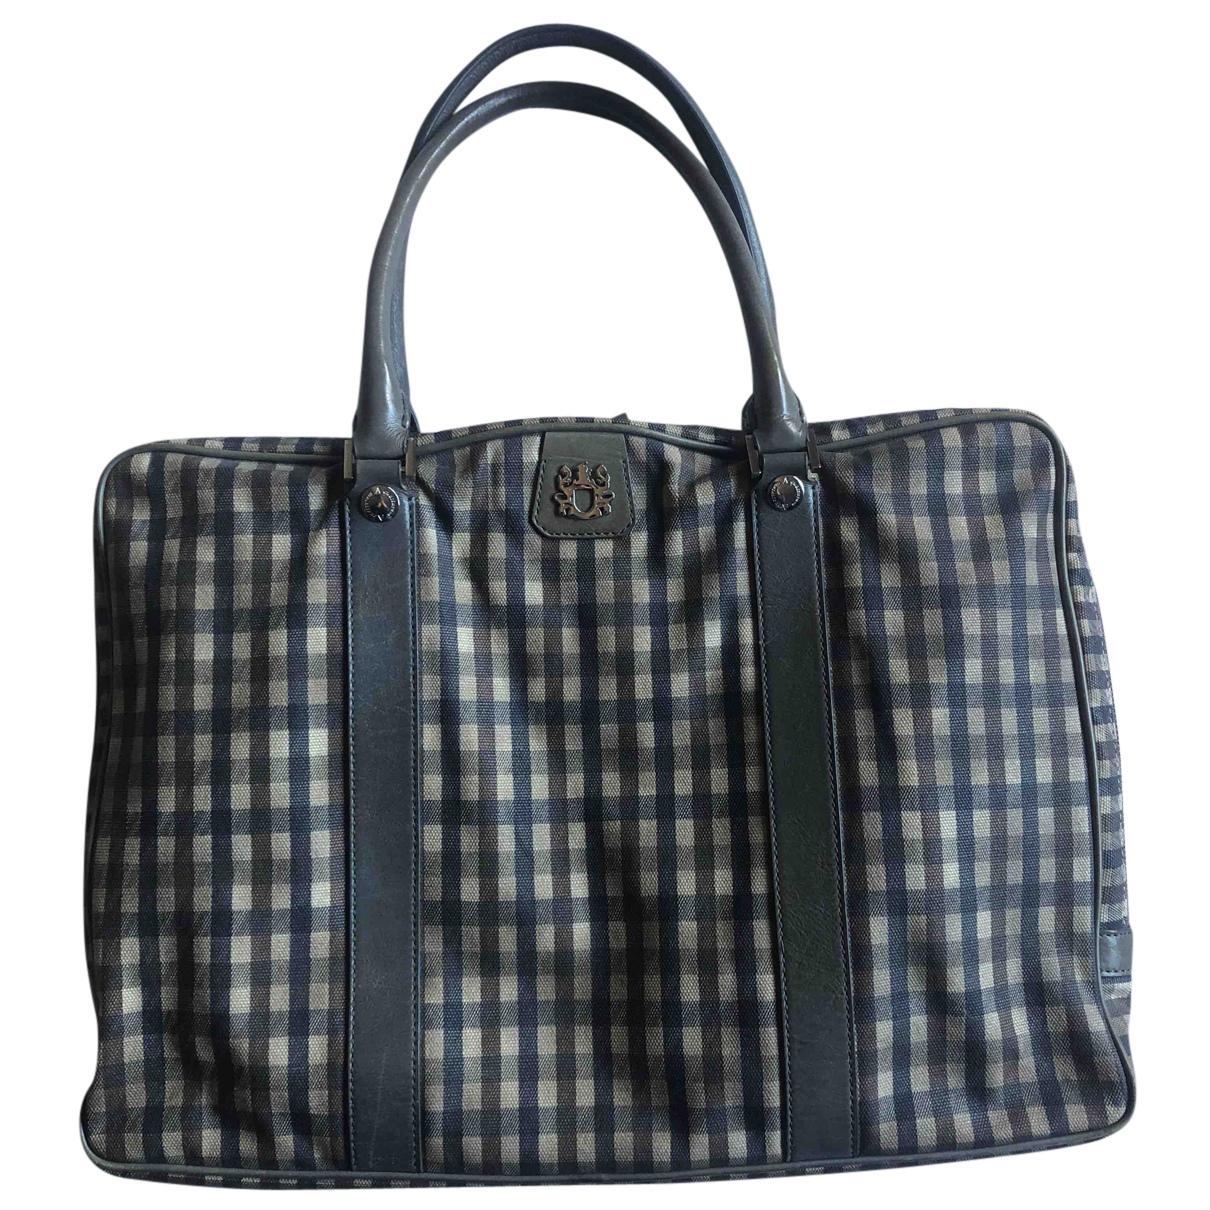 Aquascutum N Beige Leather handbag for Women N